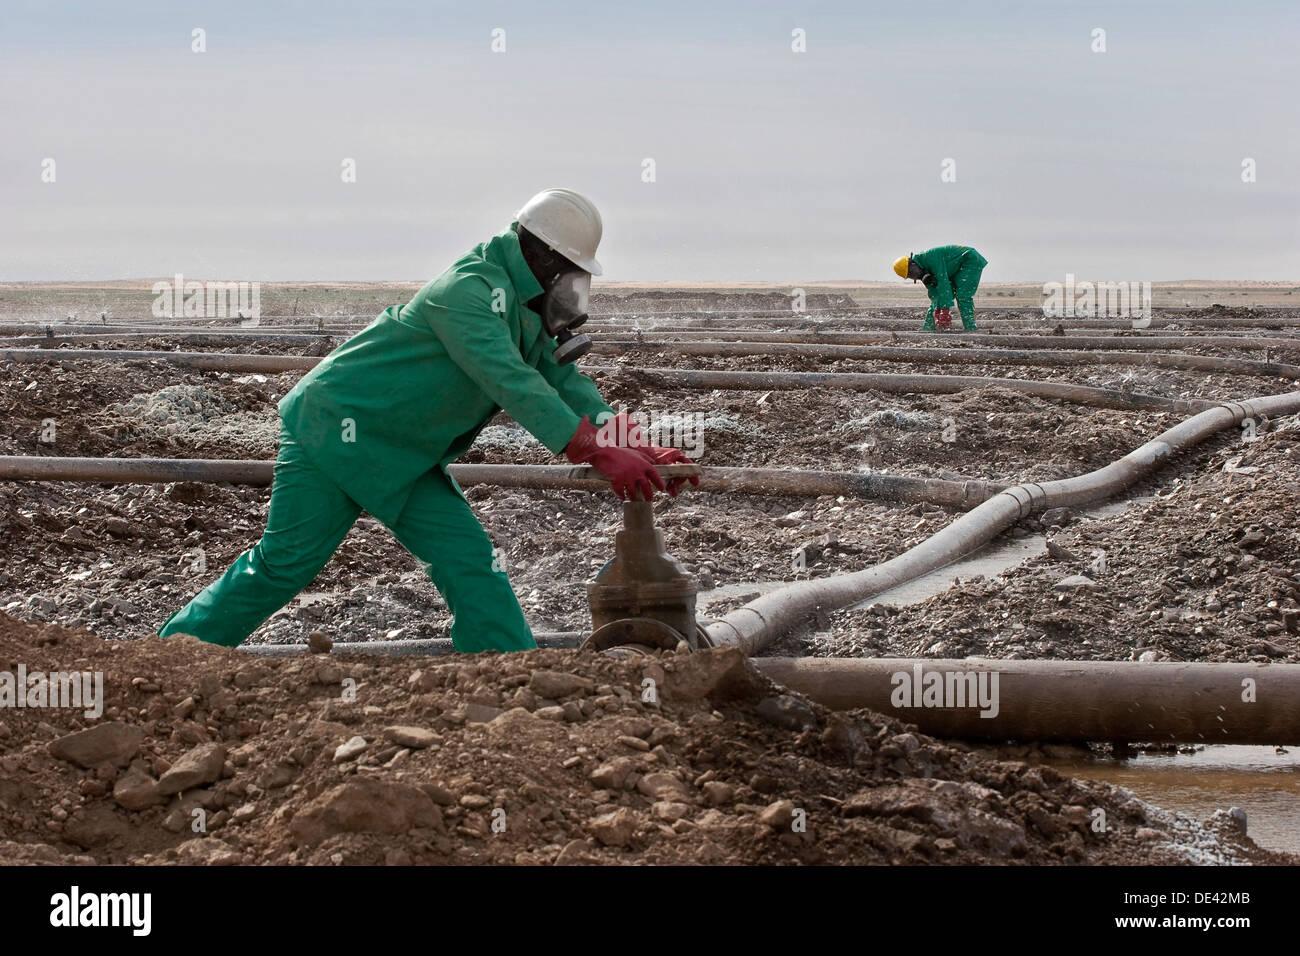 Operator adjusting valve on sprinkler system on dump heap leach pad. Surface gold mine. Mauritania, North West Africa - Stock Image